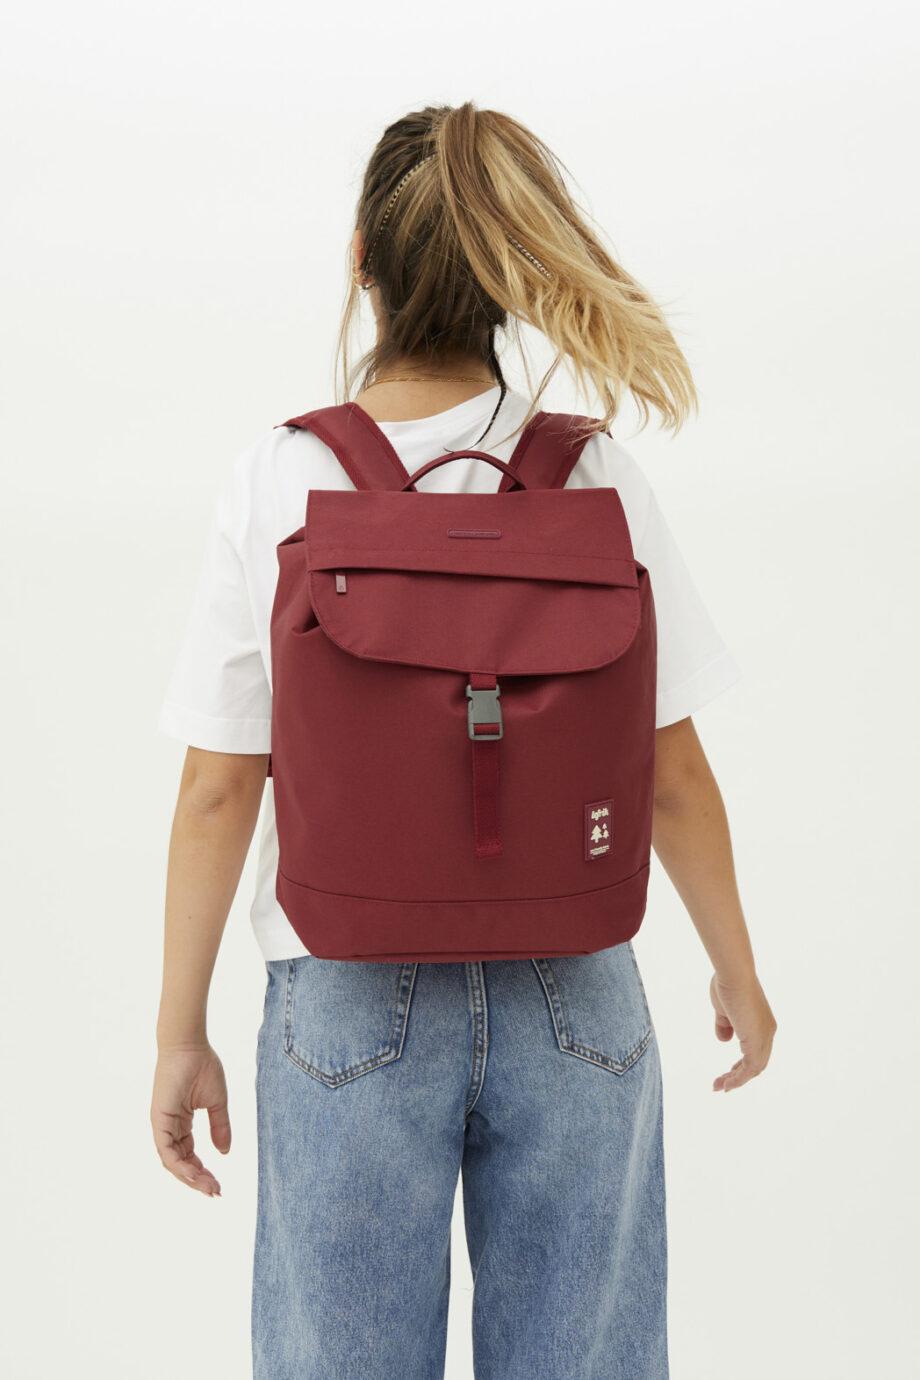 Duurzame tassen_Lefrik_Scout_Granate_achter